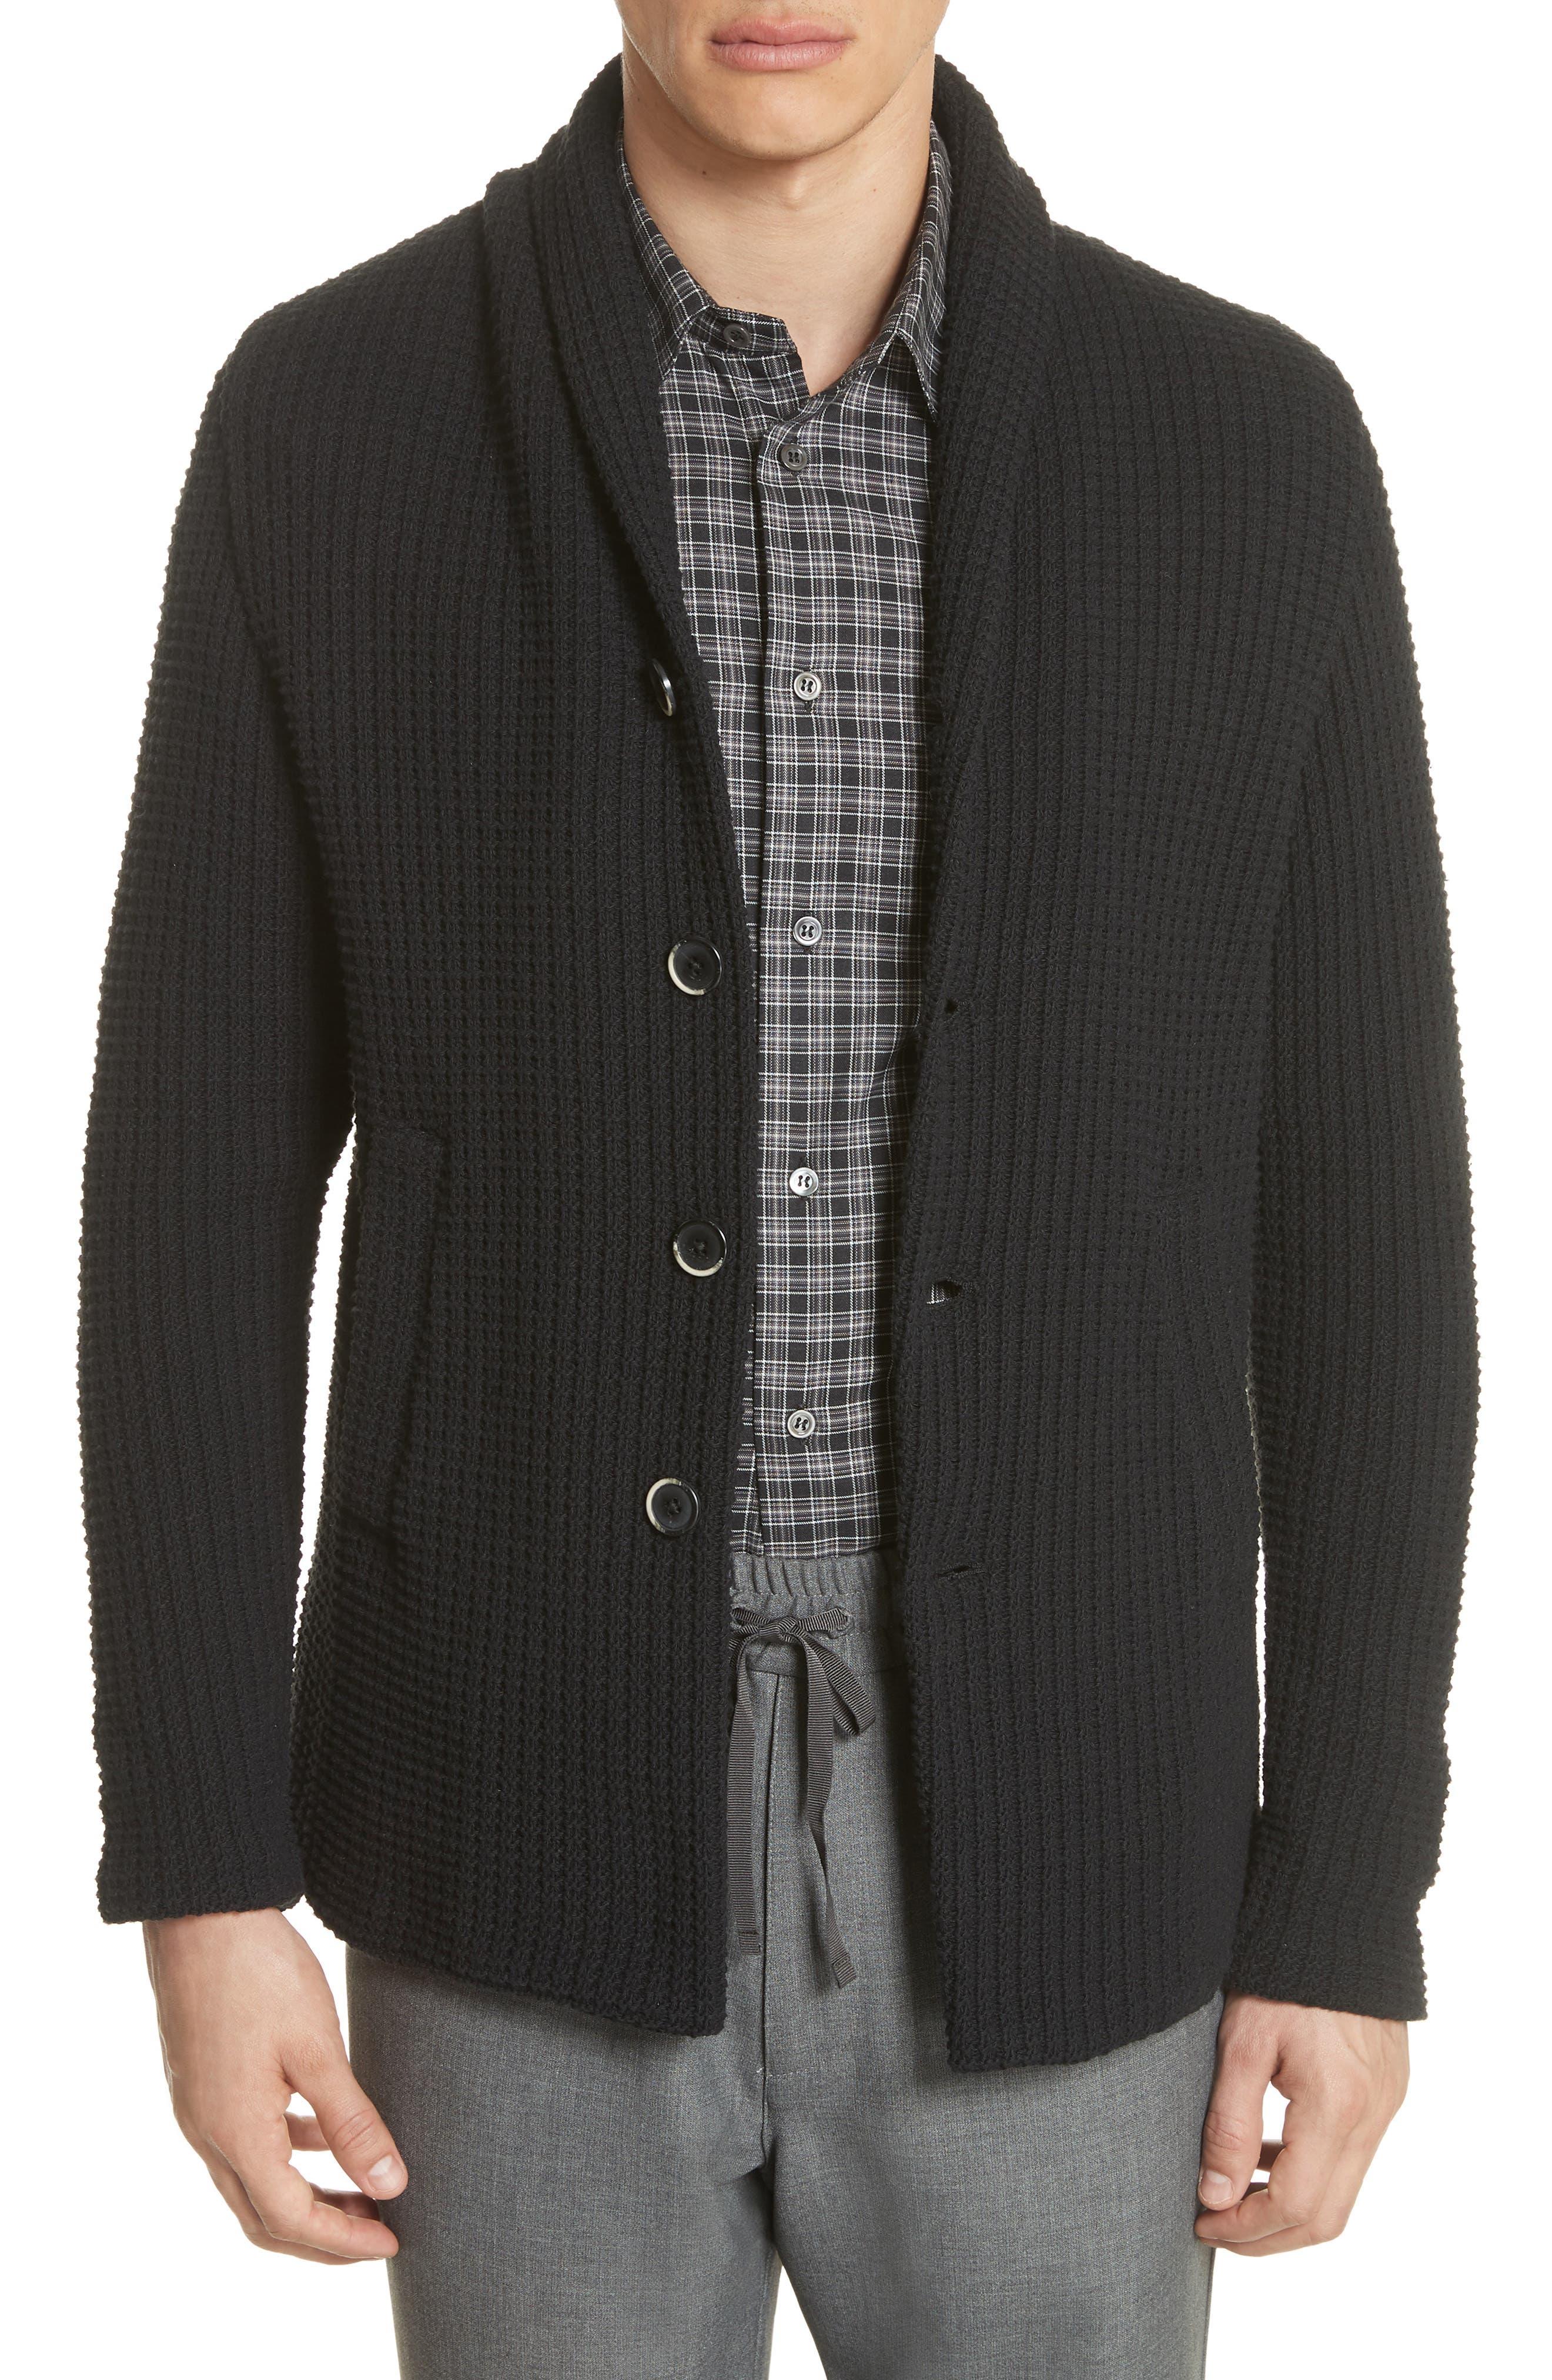 Barena Venzia Lione Badoer Knit Jacket,                         Main,                         color, 001